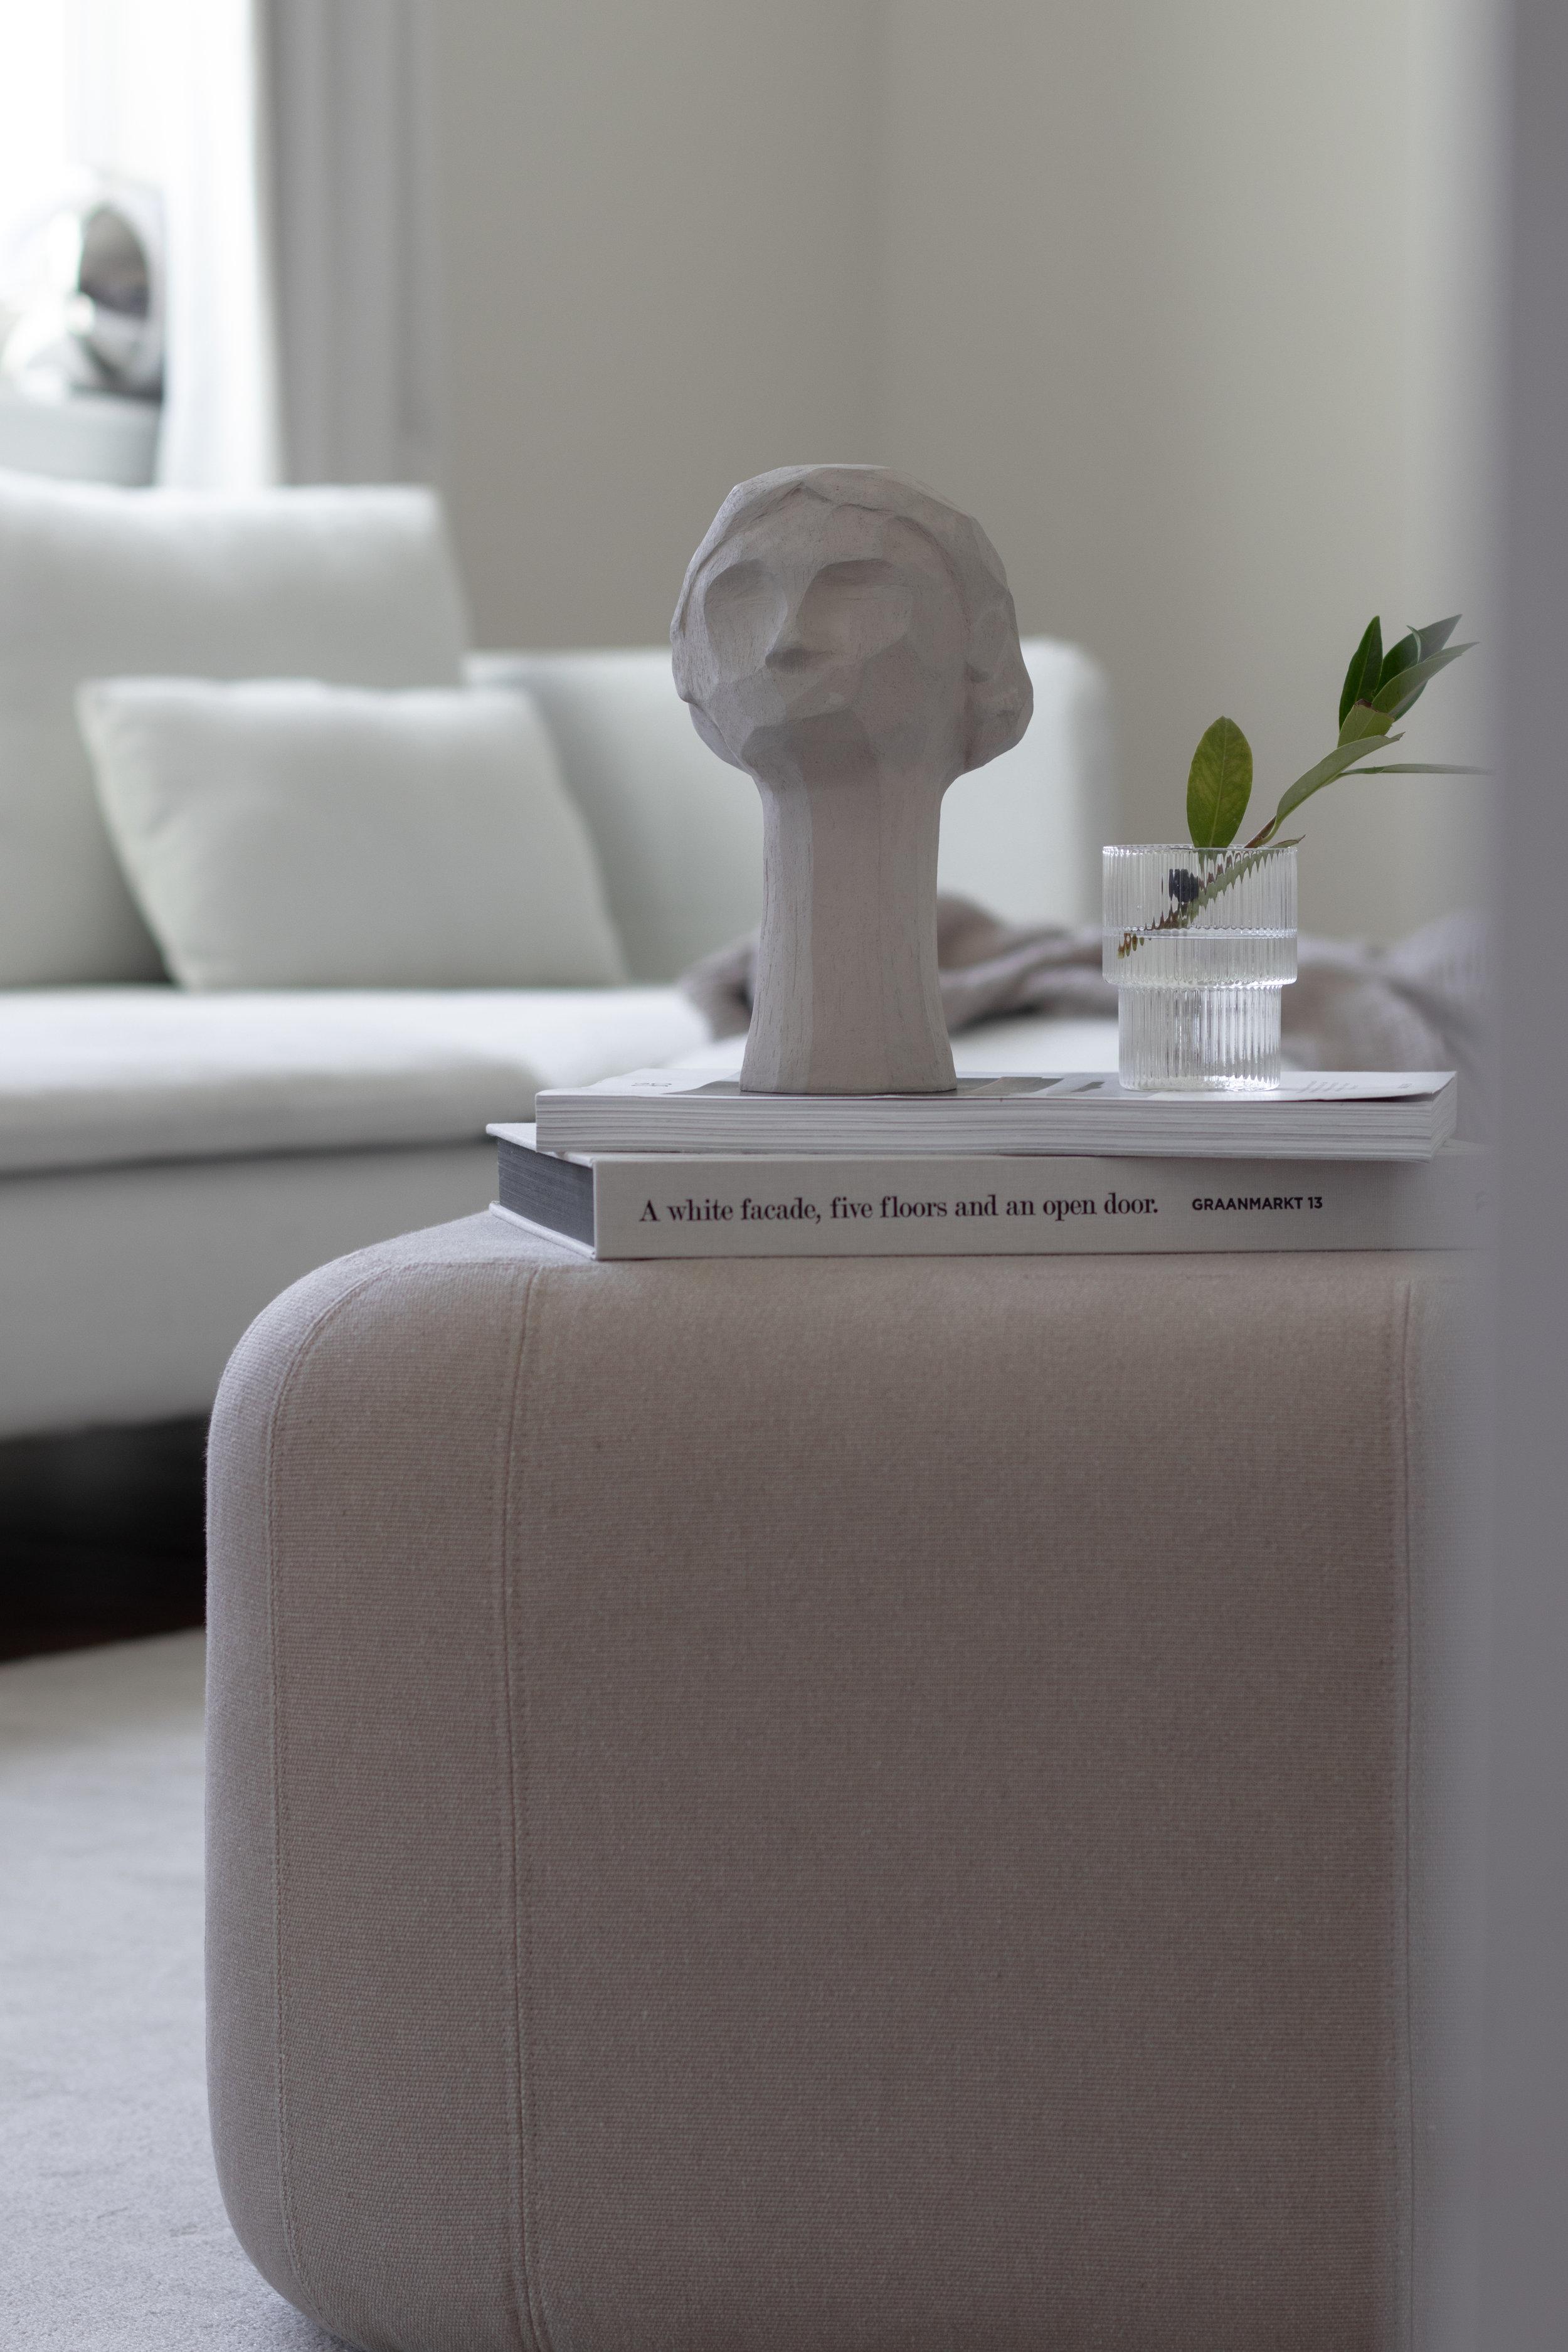 Kristiina x Catcooe collaboration sculptures in a minimal settin